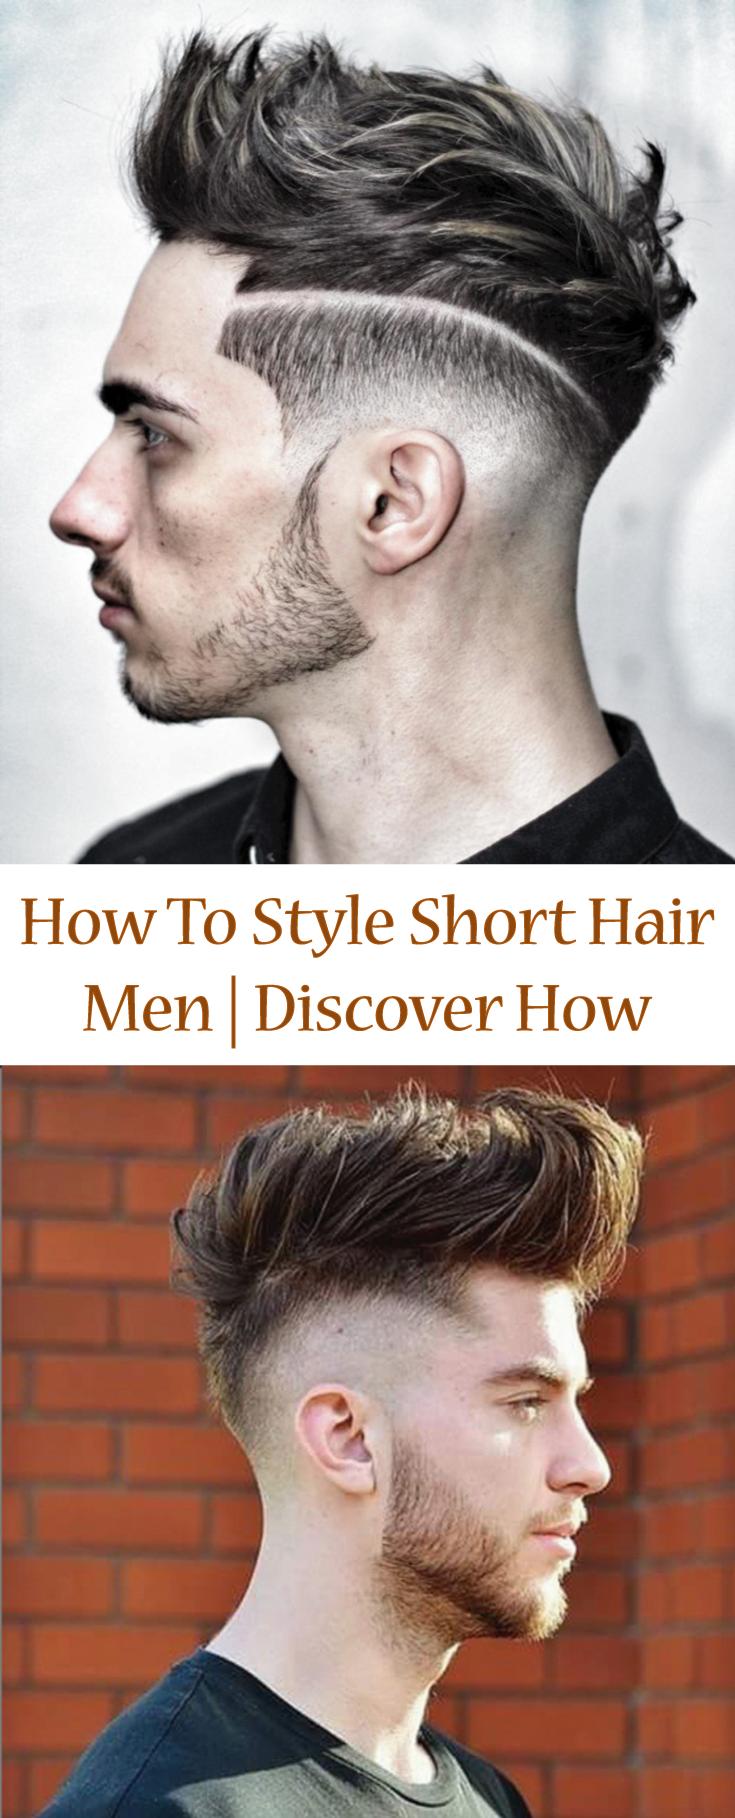 How To Style Short Hair Men Short Hair Hair Style And Undercut